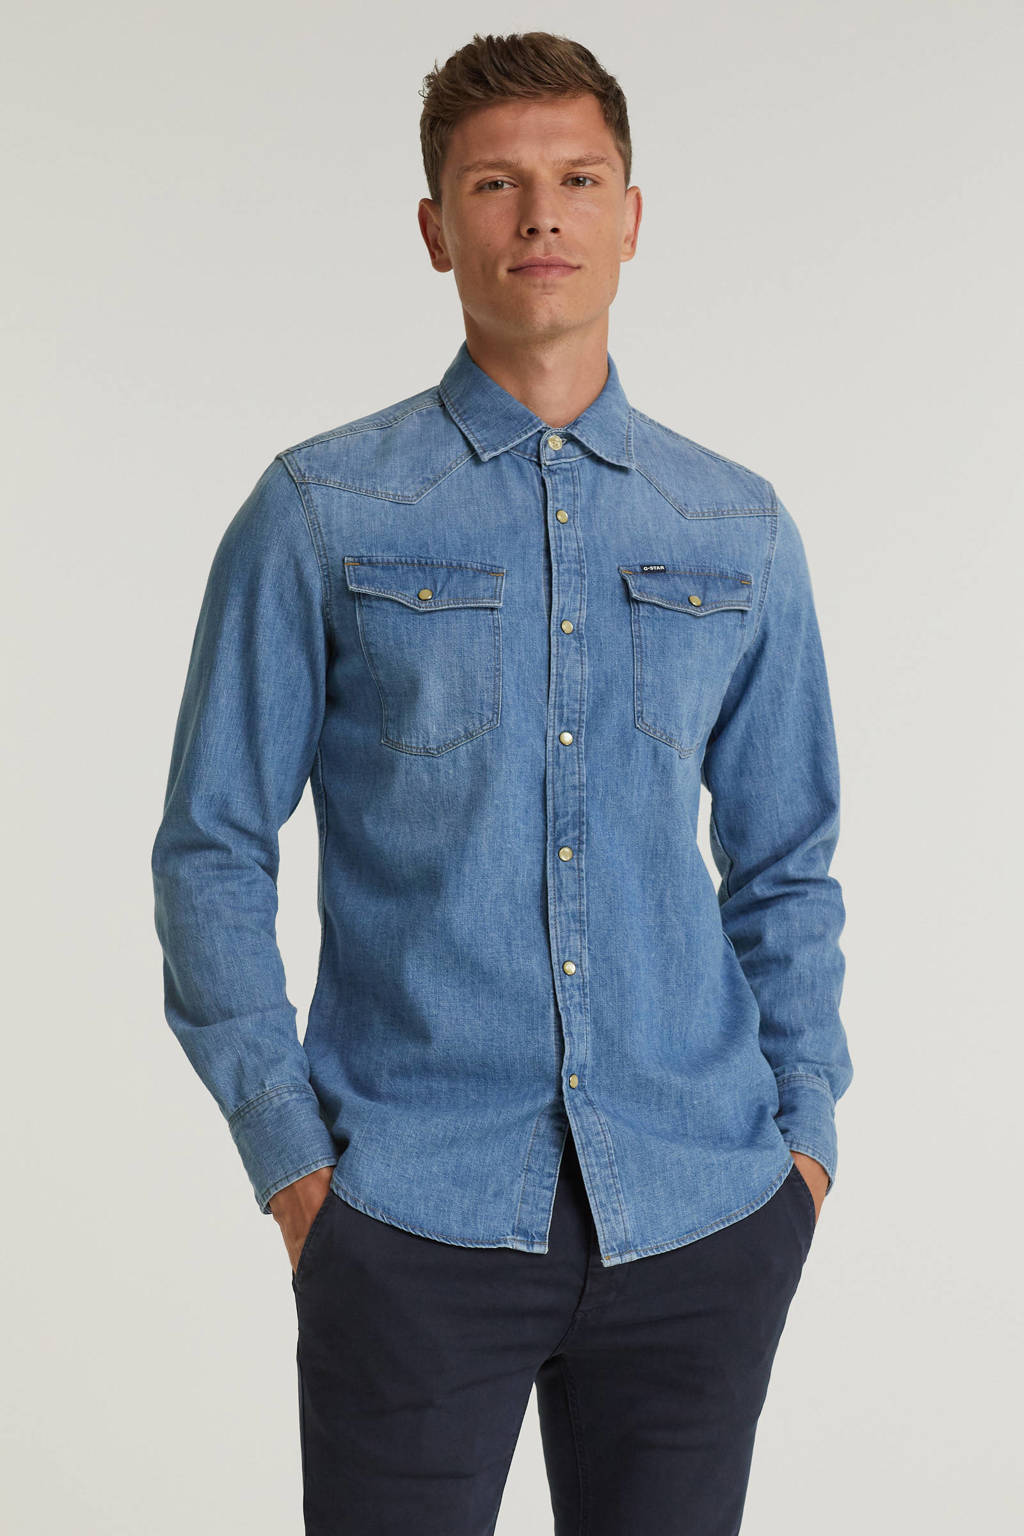 G-Star RAW slim fit denim overhemd 3301 medium aged, Medium aged